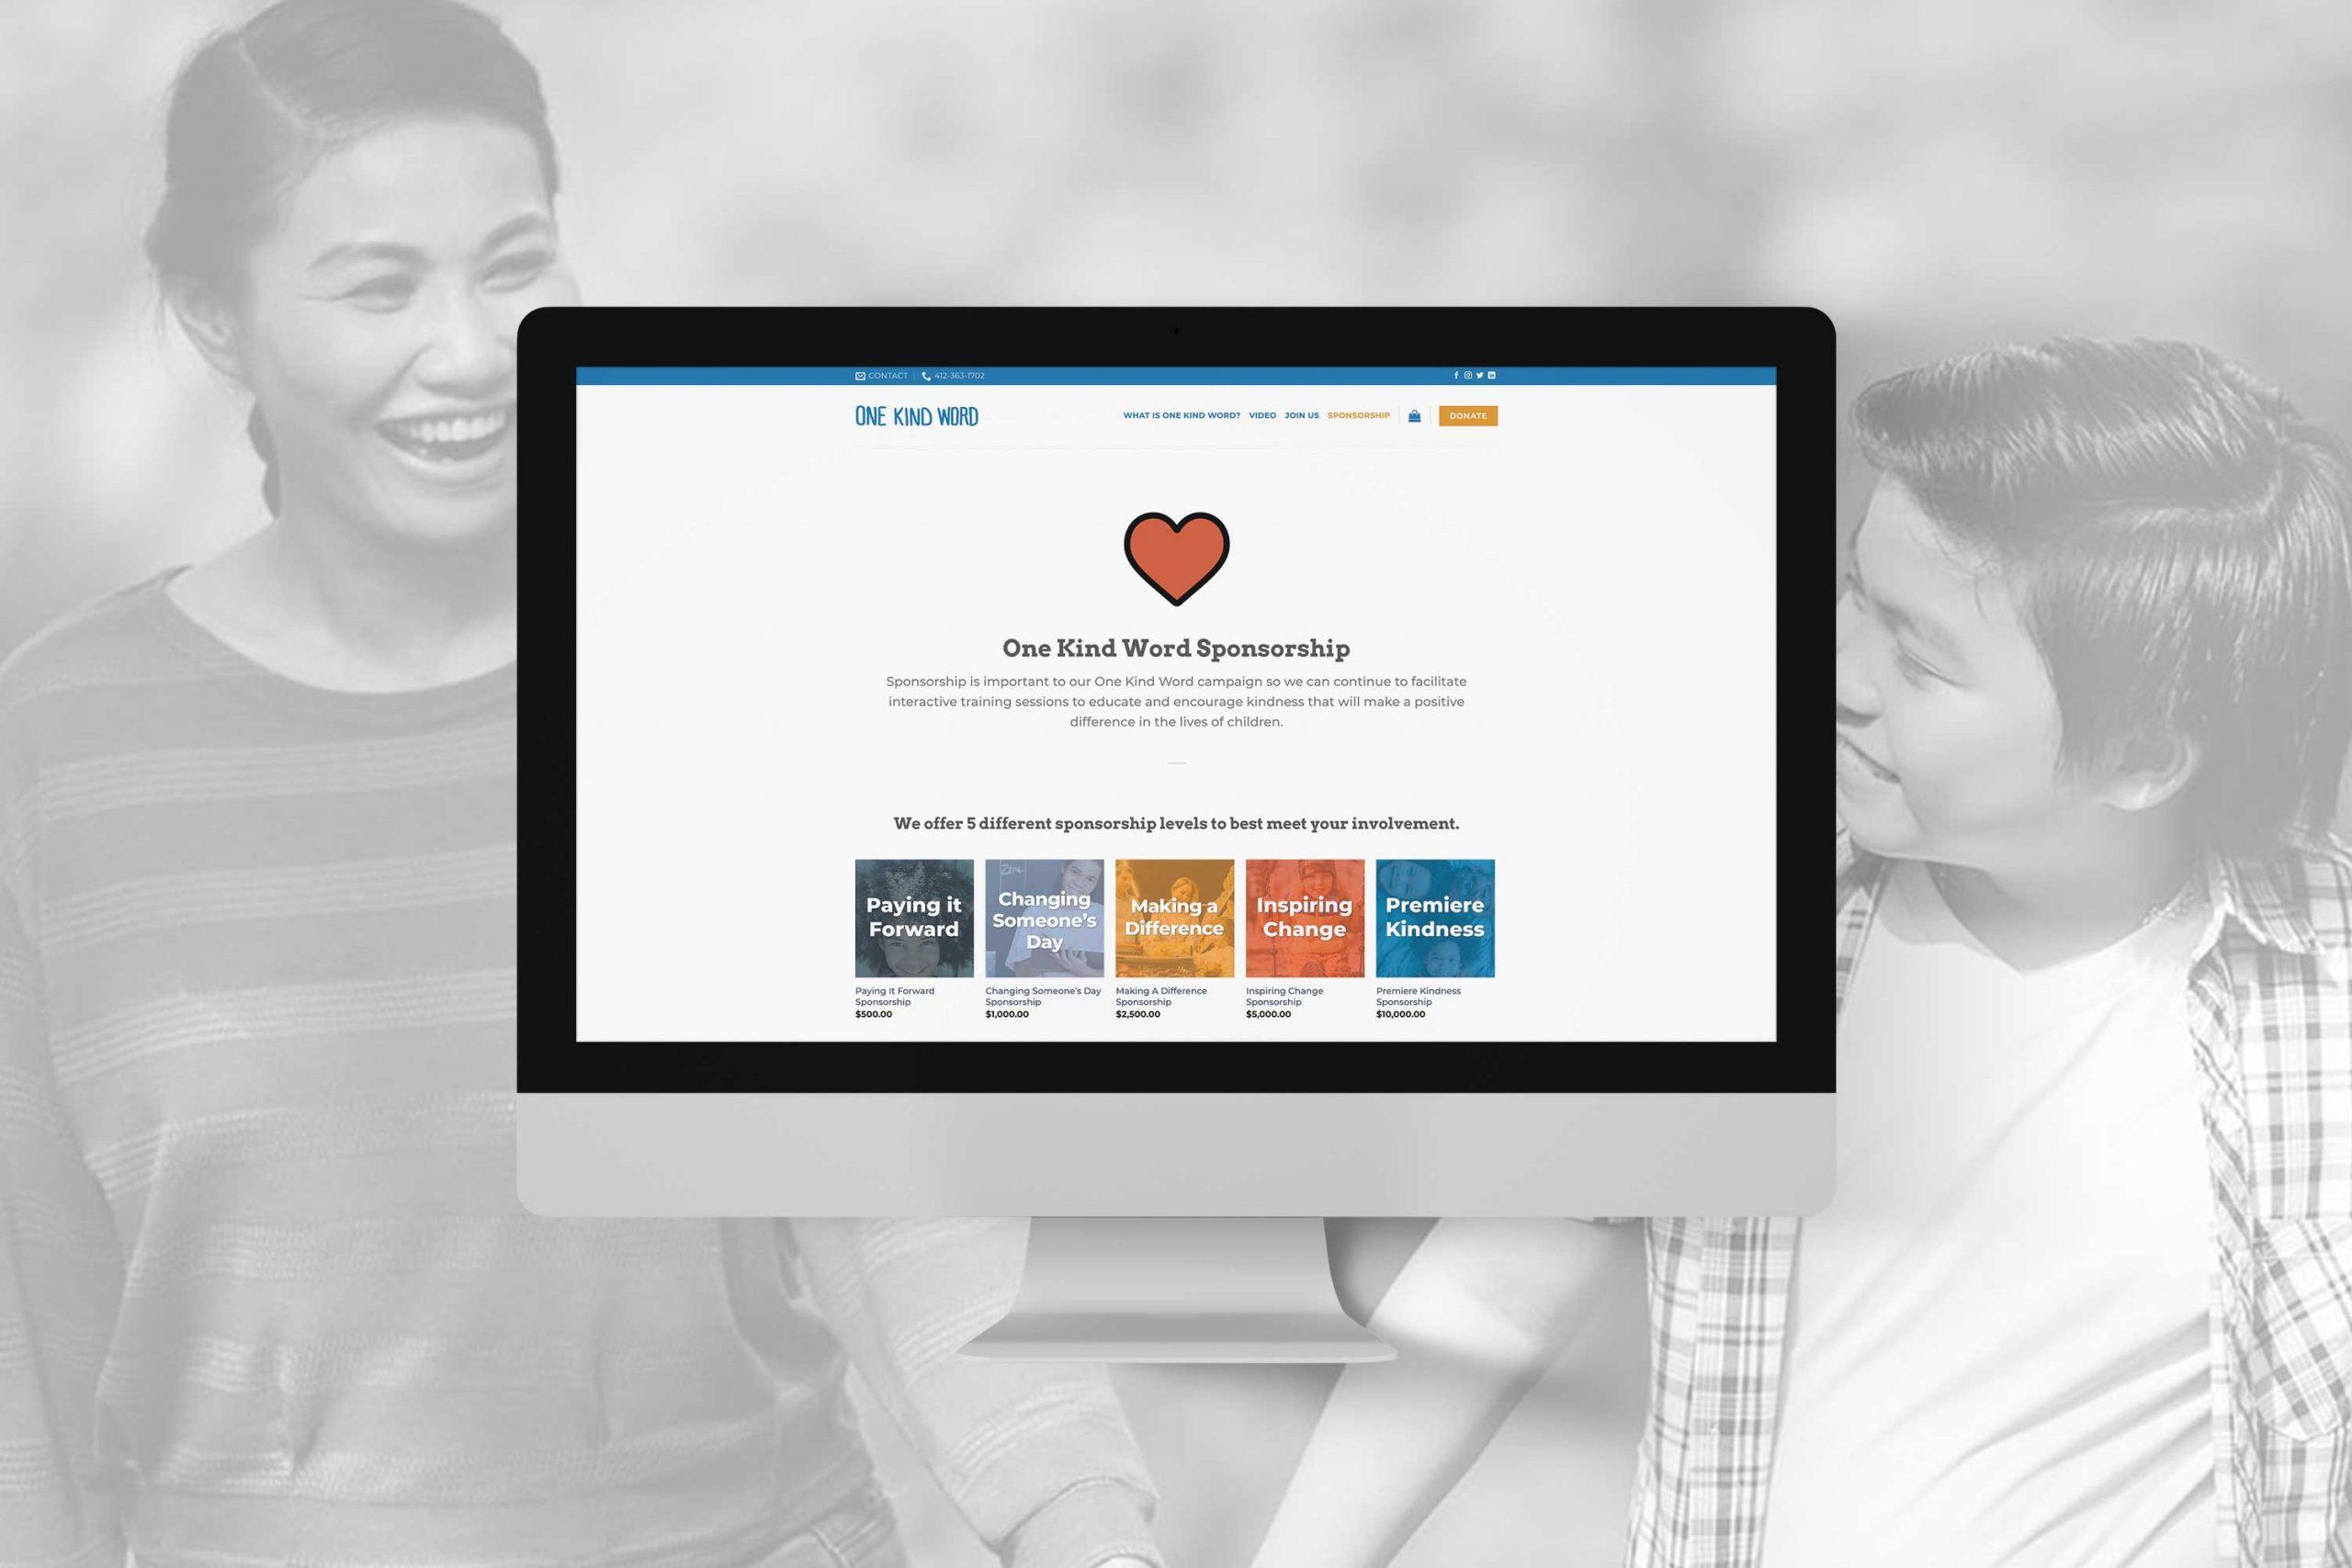 photo mockup of One Kind Word website, sponsorship page